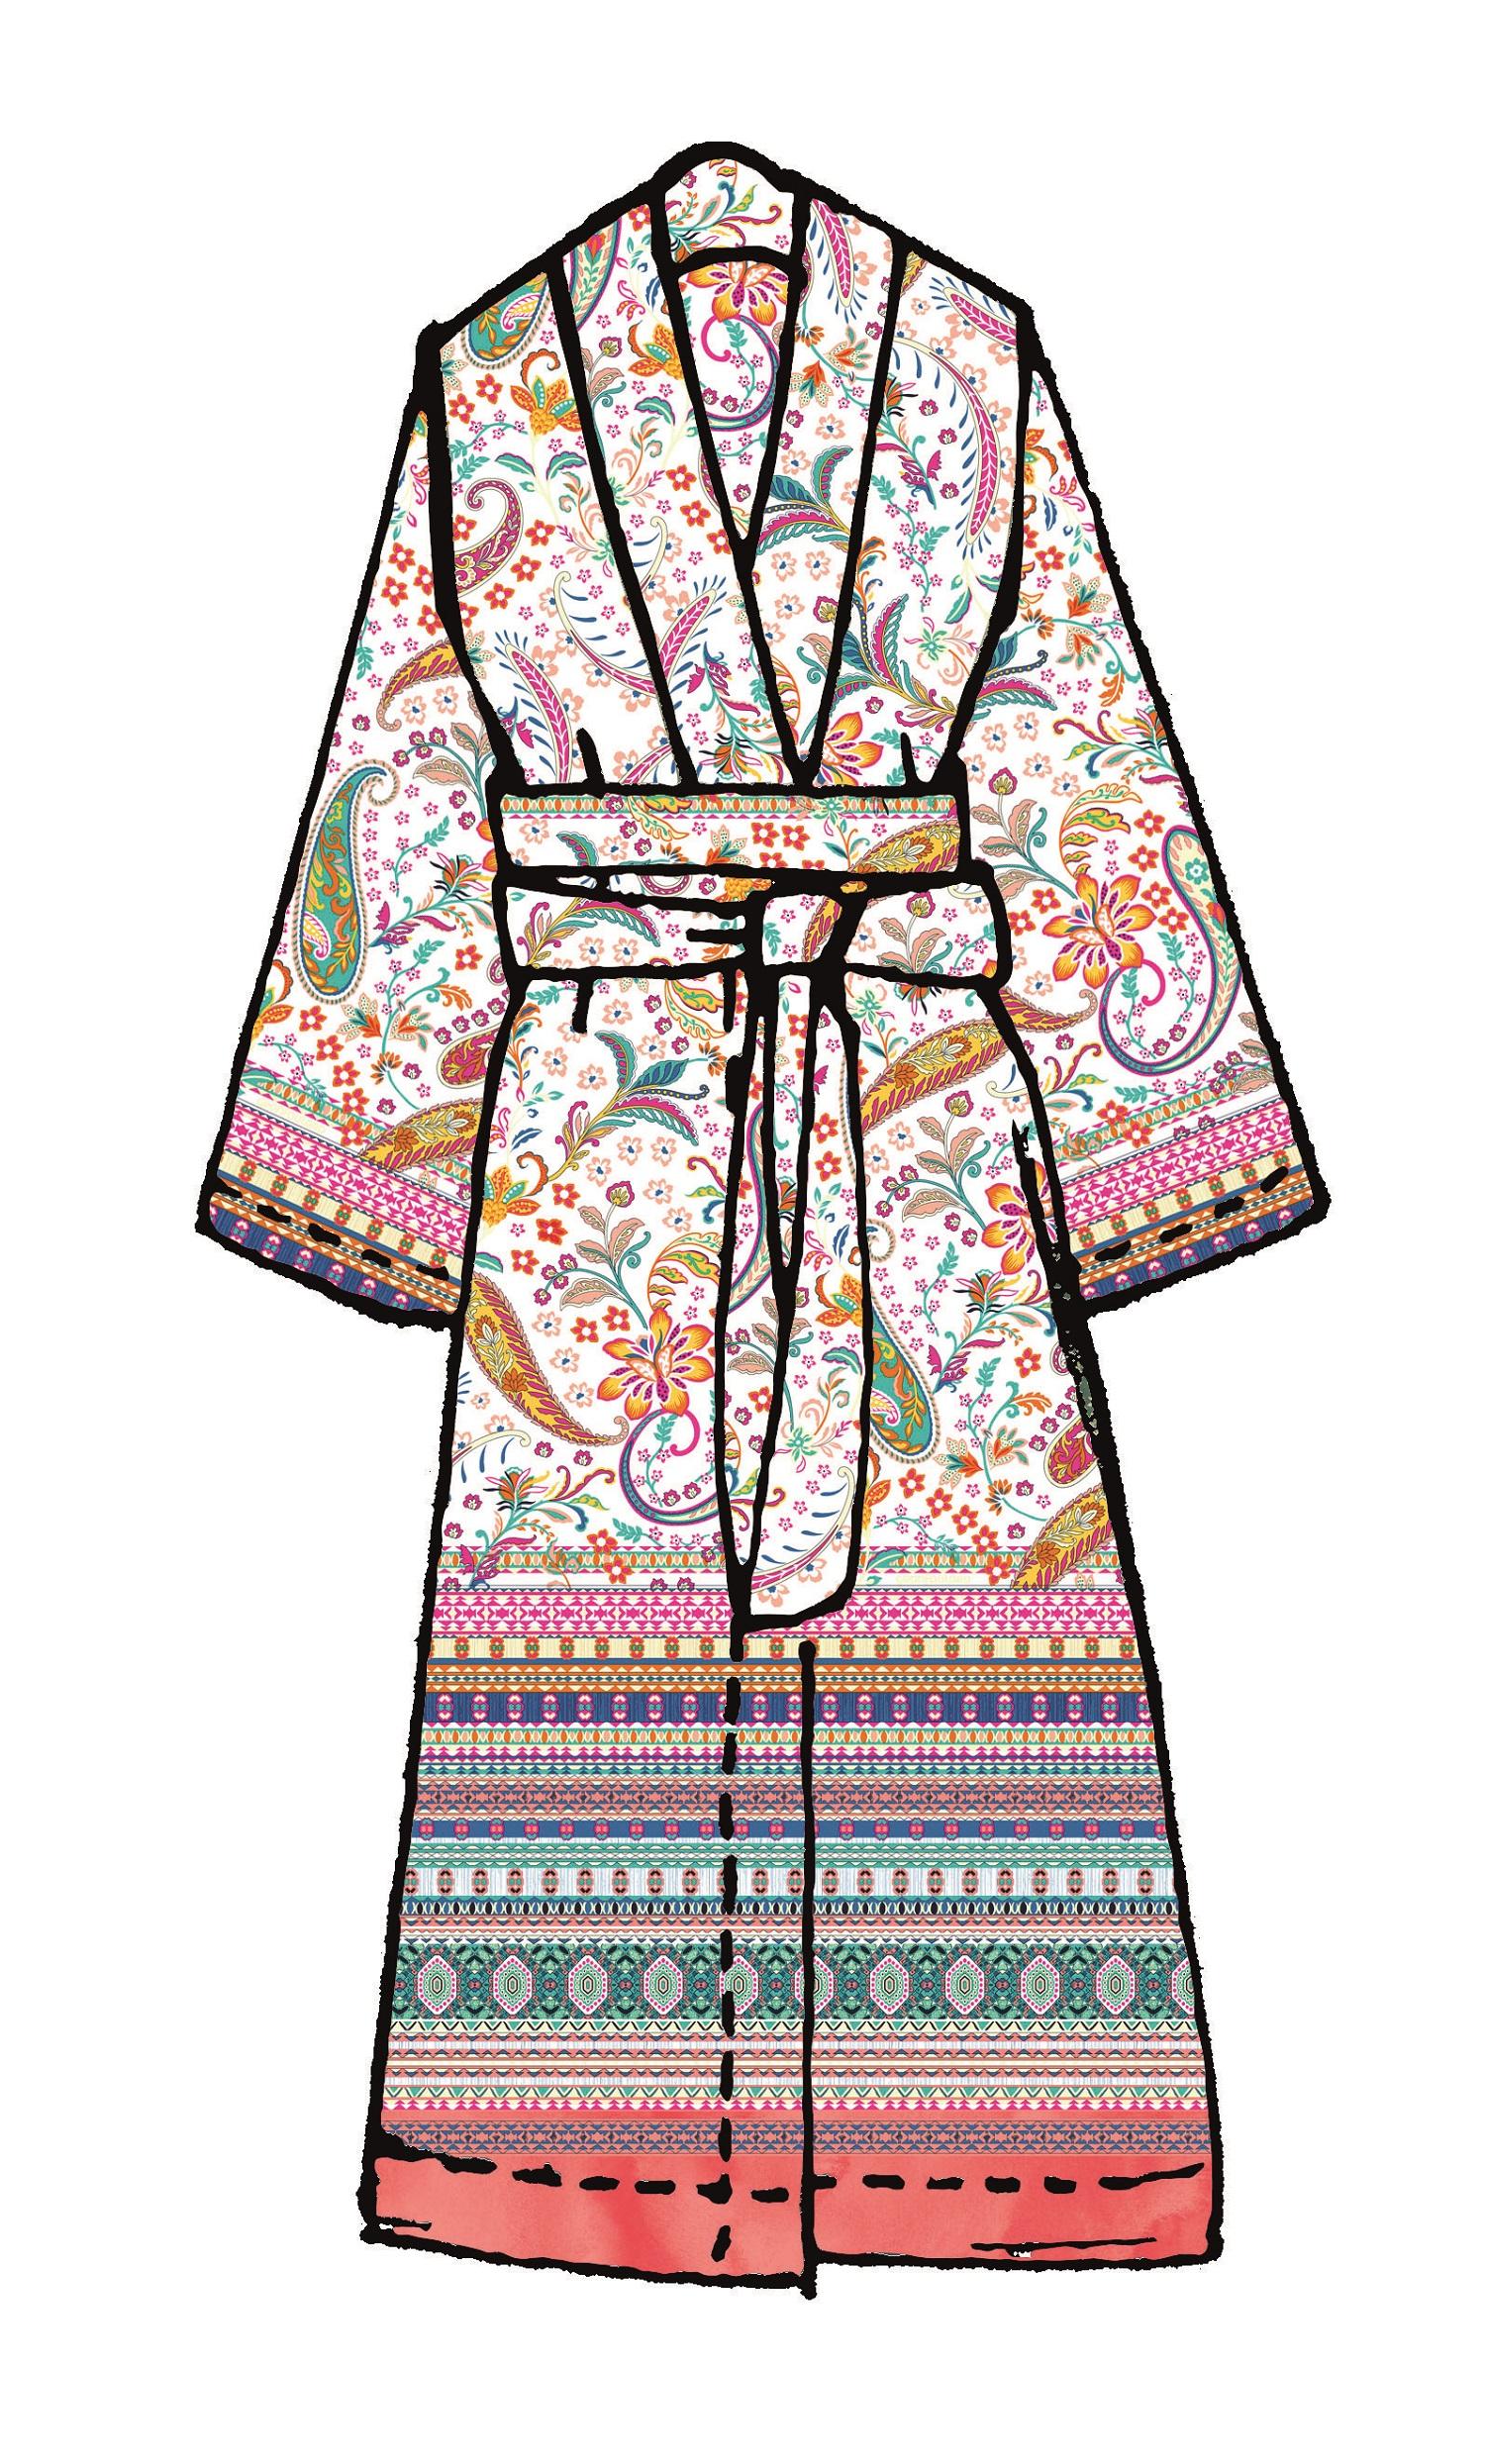 bassetti Kimono Burano R 1 Rosa Größe S-M aktuelle Kollektion 2020 Paisley